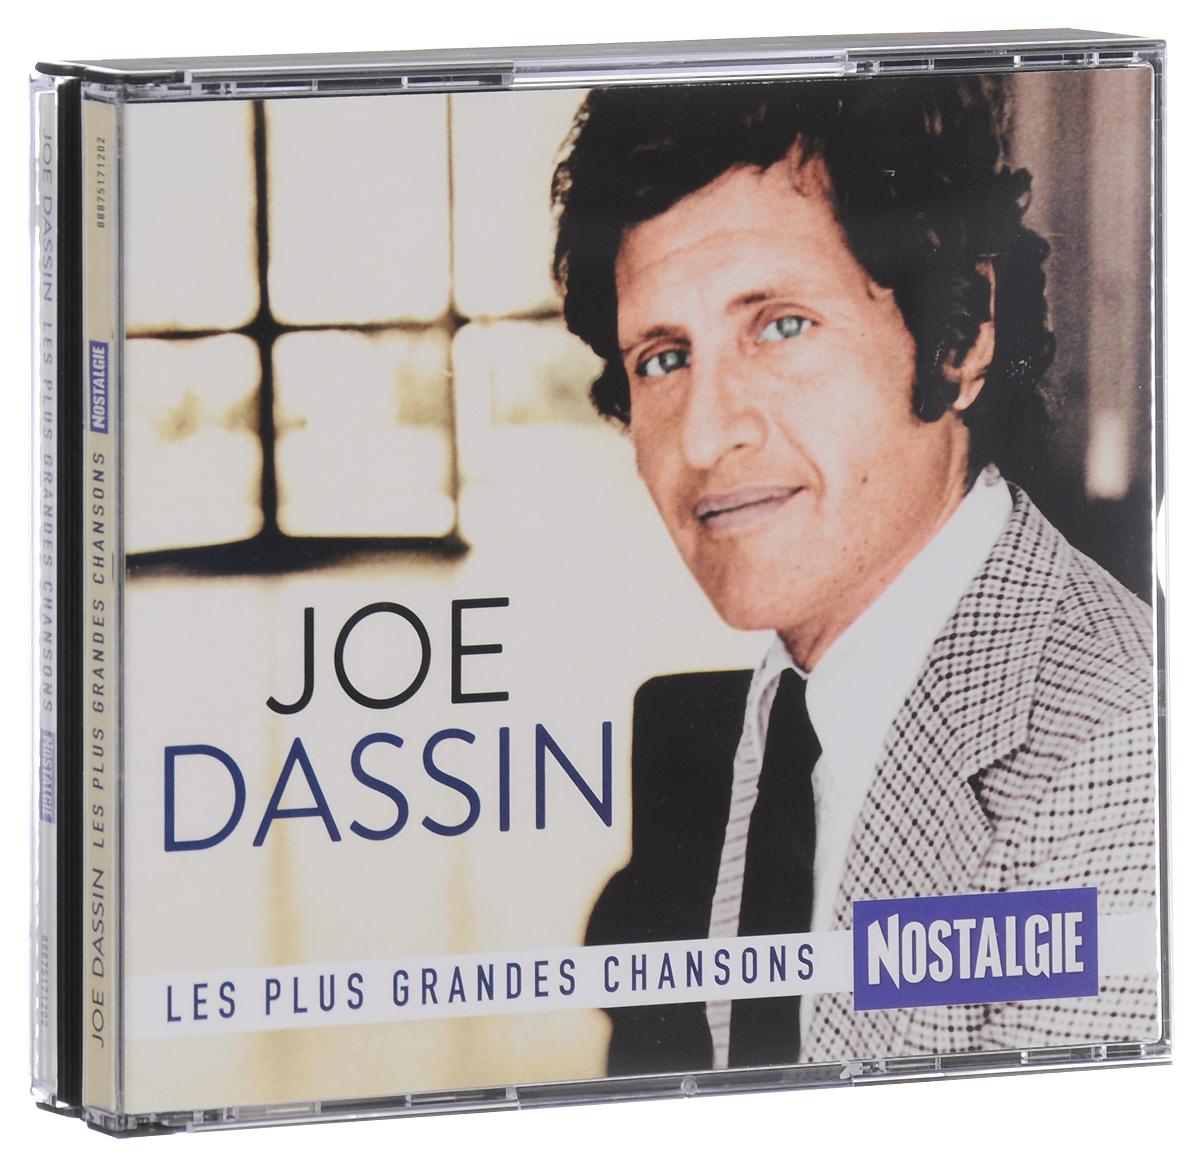 Joe Dassin. Les Plus Grandes Chansons Nostalgie (2 CD)